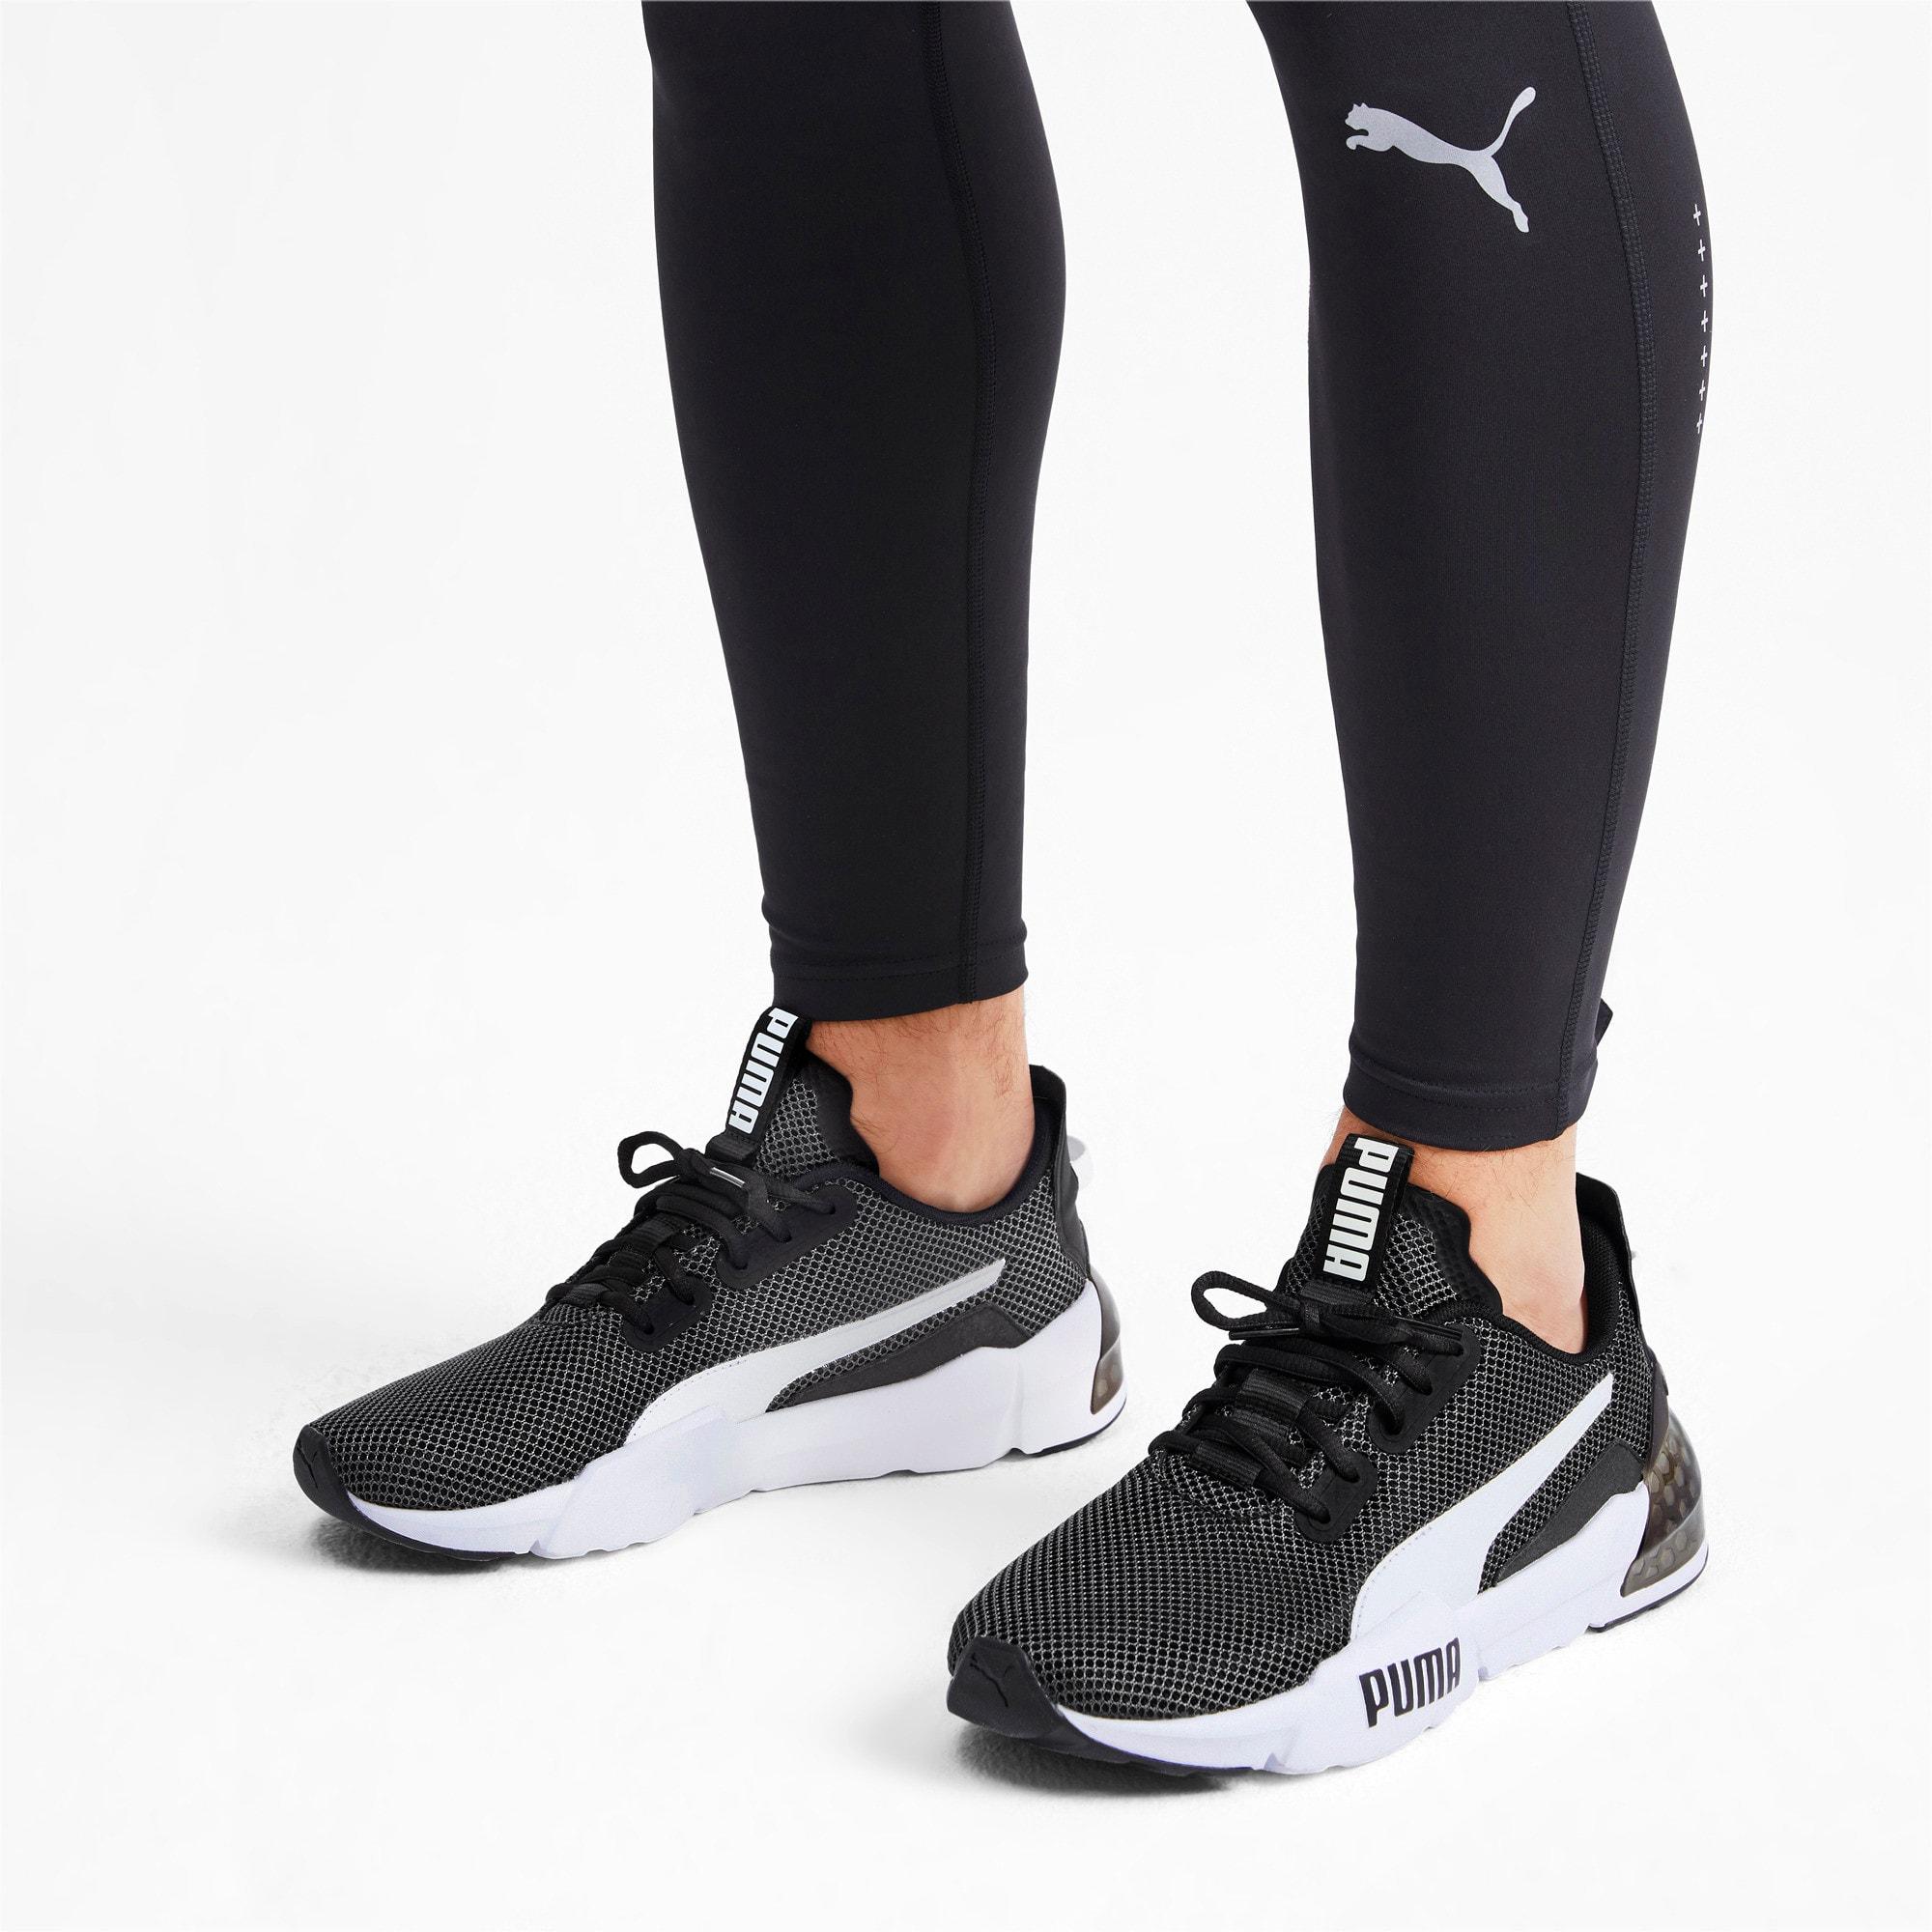 Thumbnail 2 of CELL Phase Men's Training Shoes, Puma Black-Puma White, medium